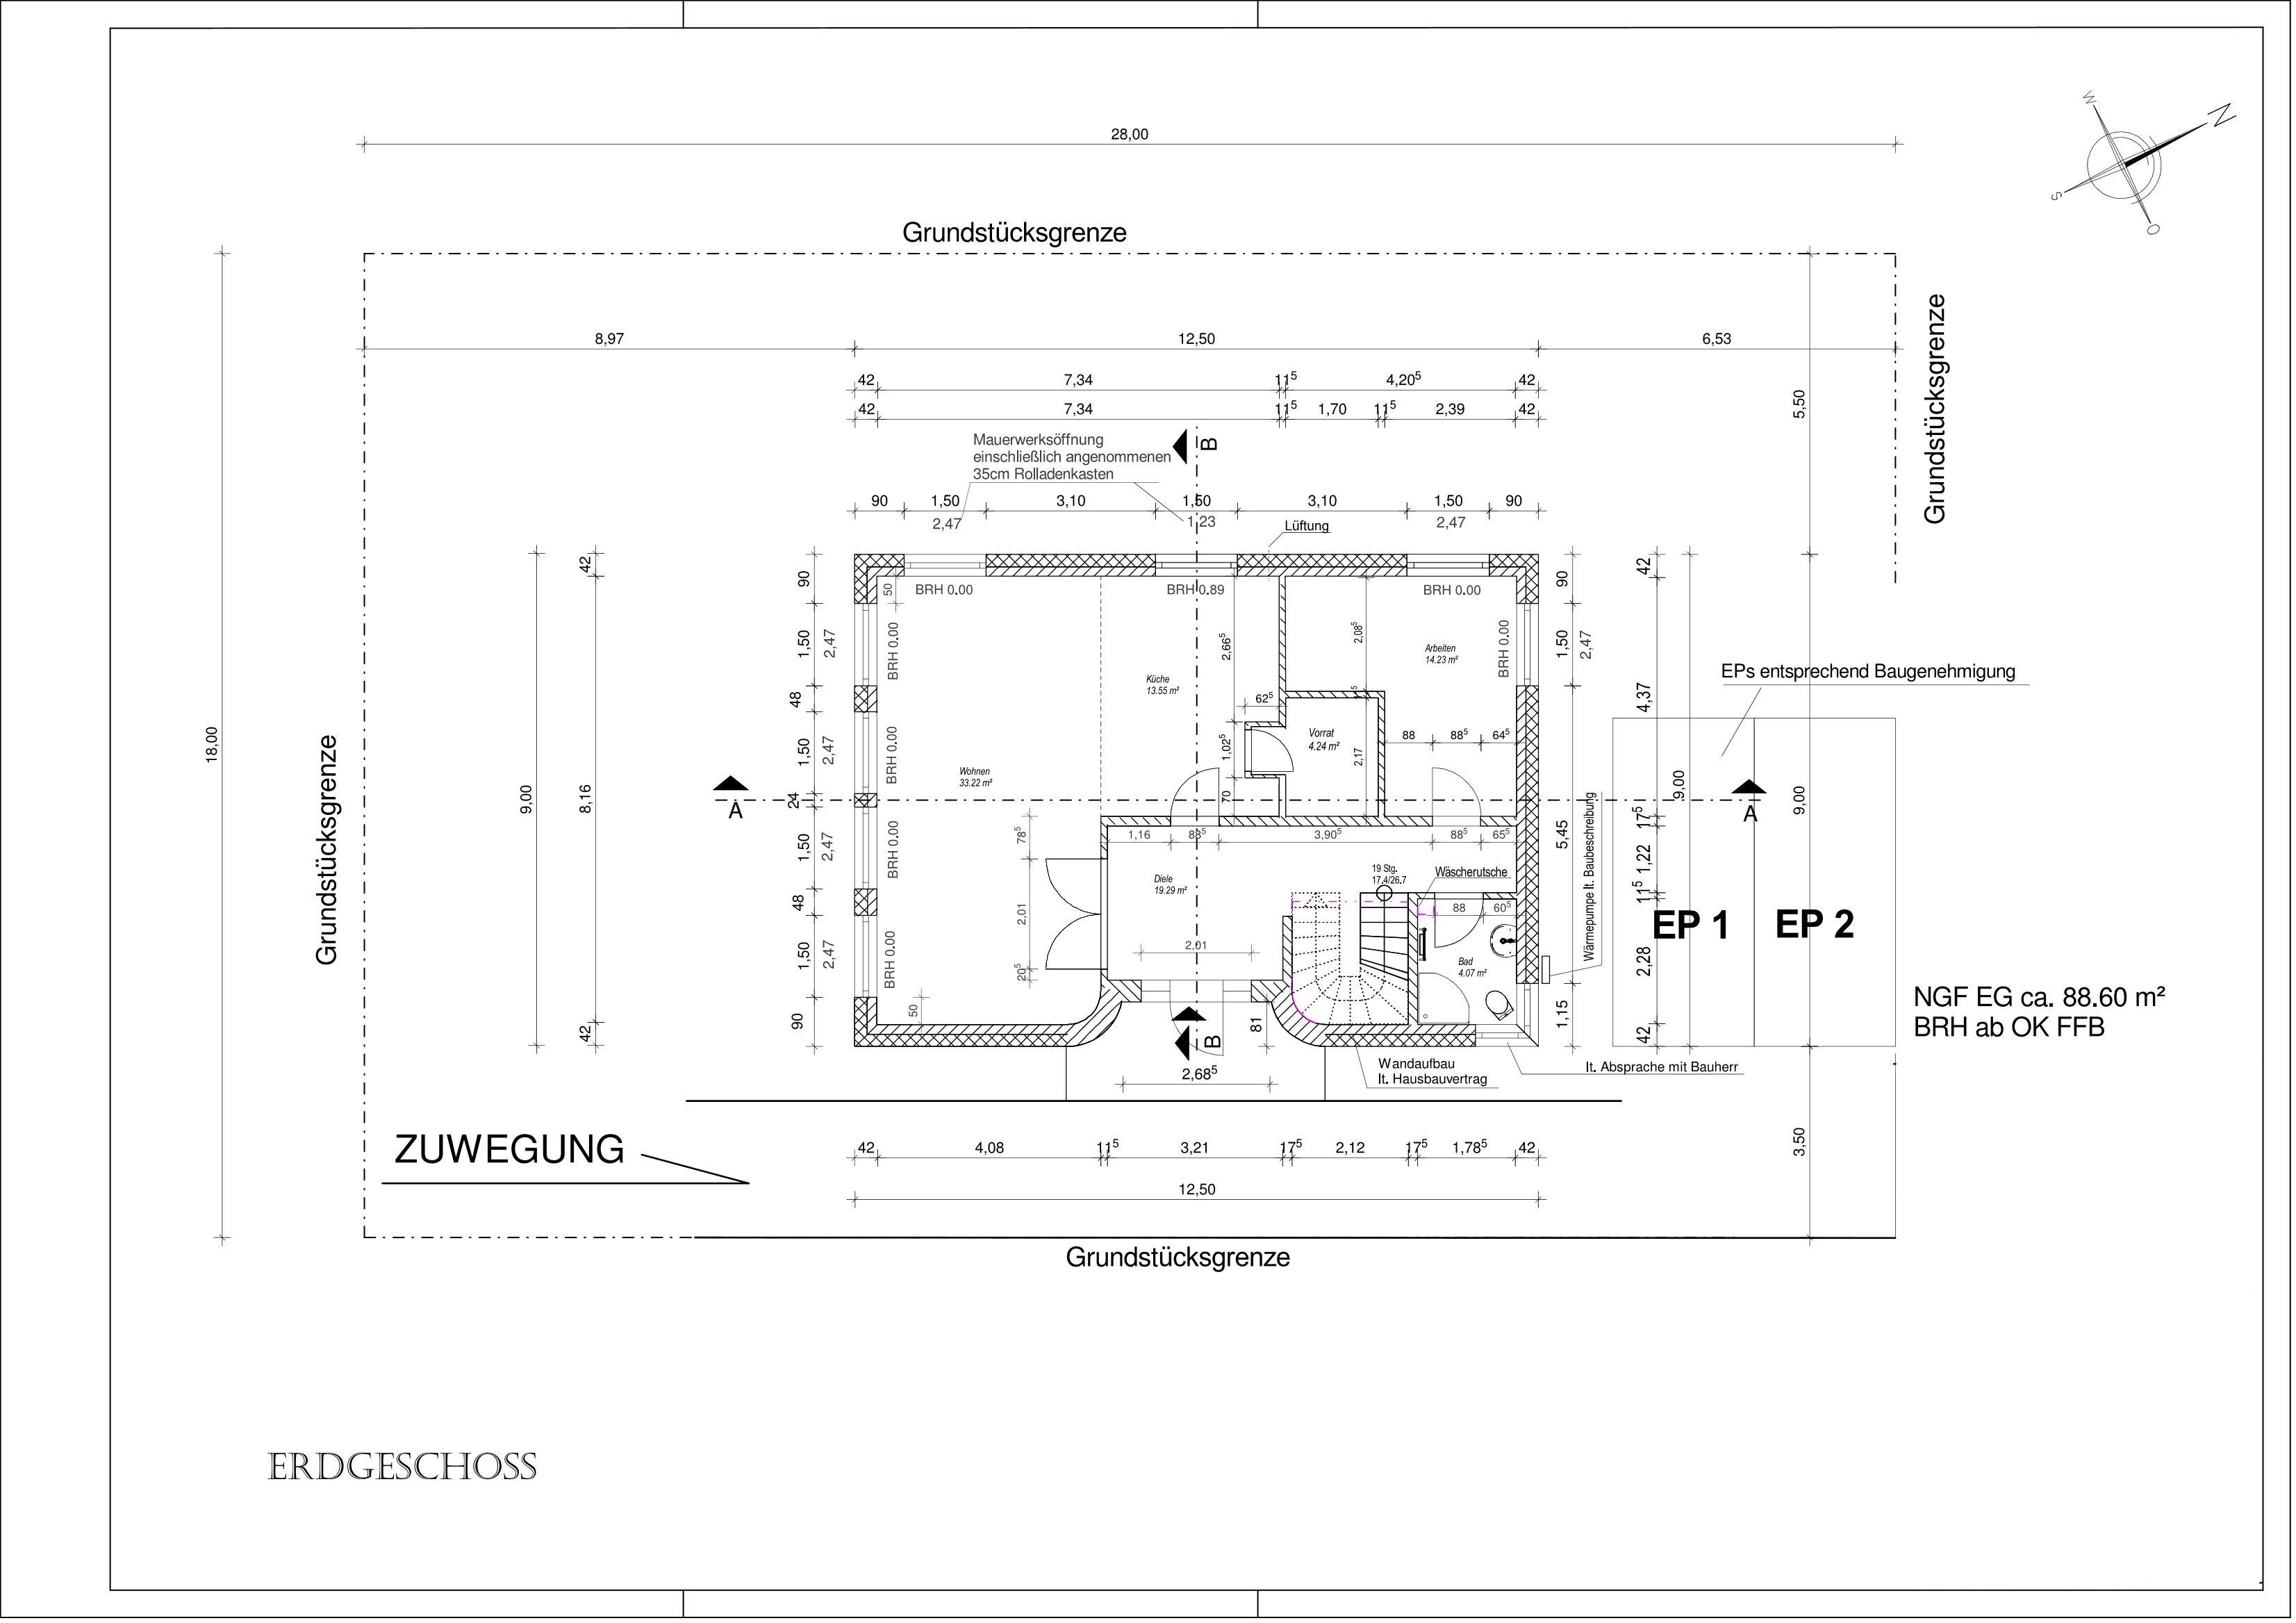 Lorenz Antragsplanung 07-2010_Page_2